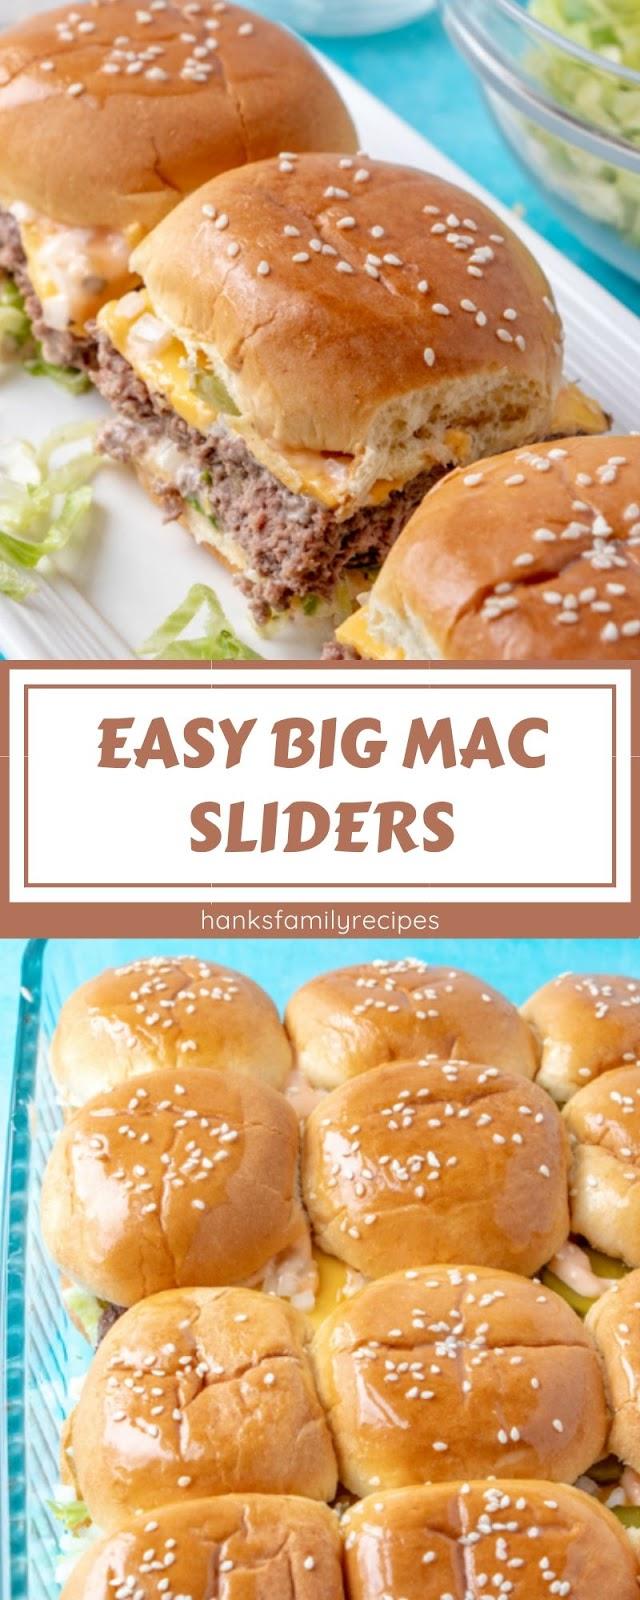 EASY BIG MAC SLIDERS